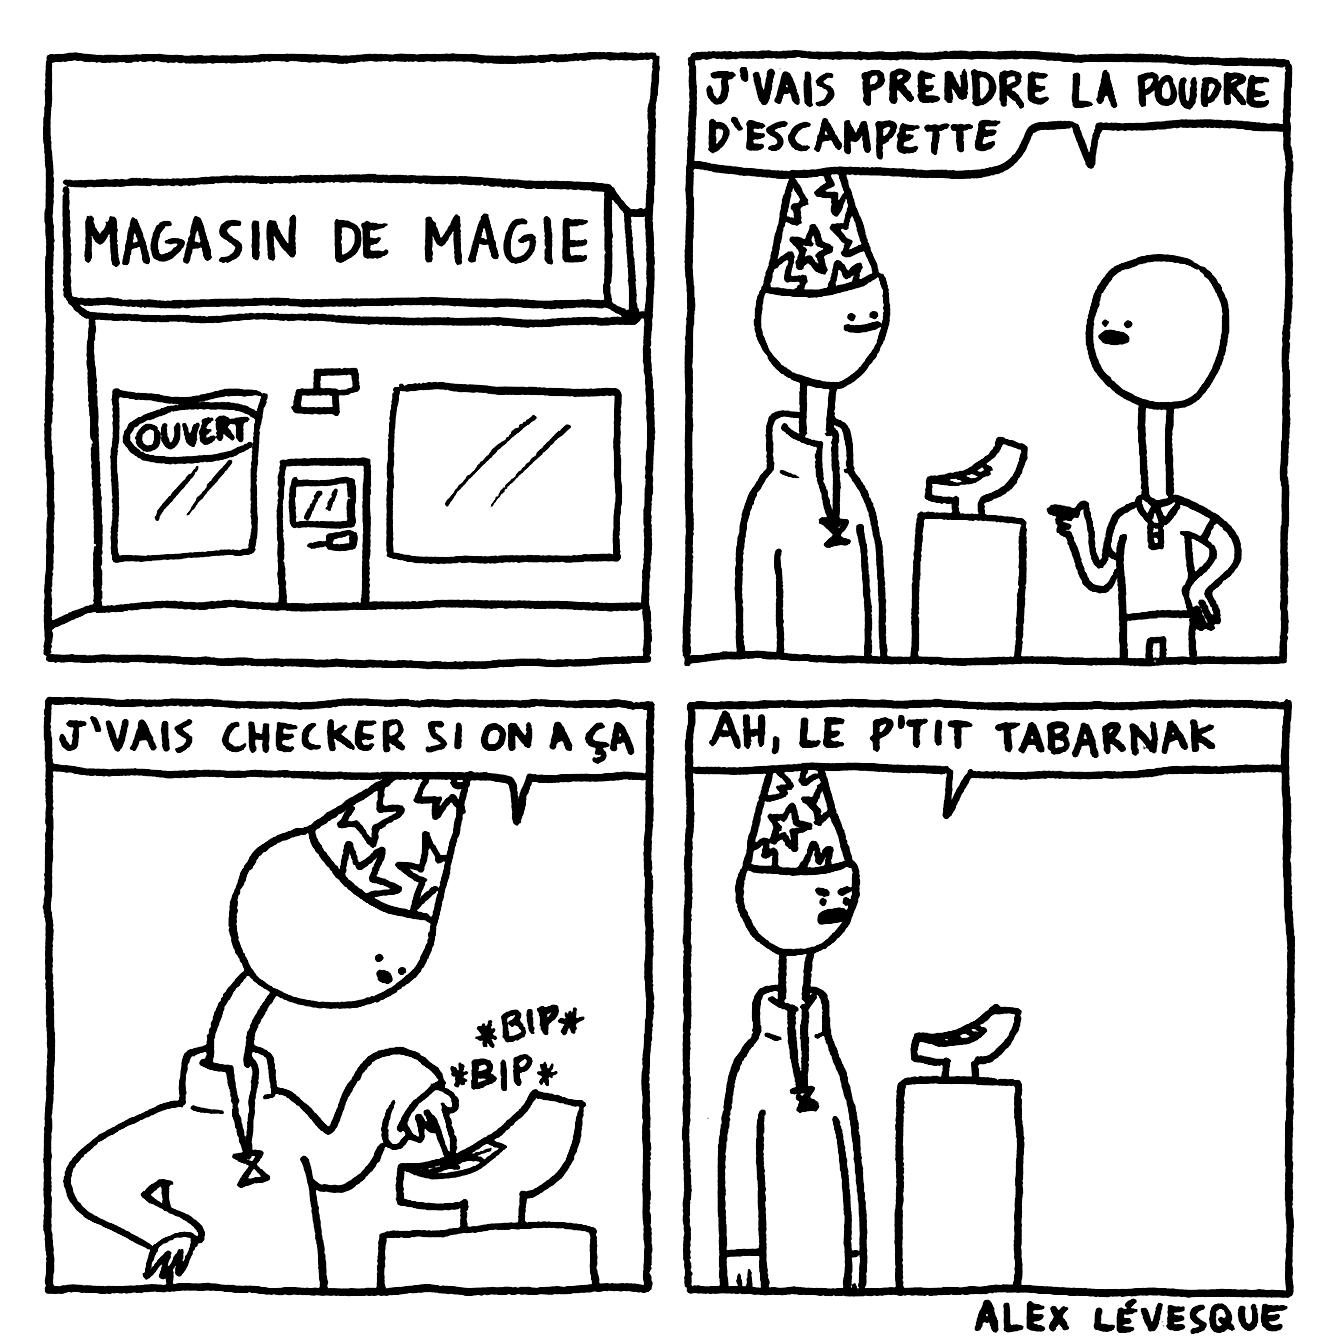 Magasin de magie